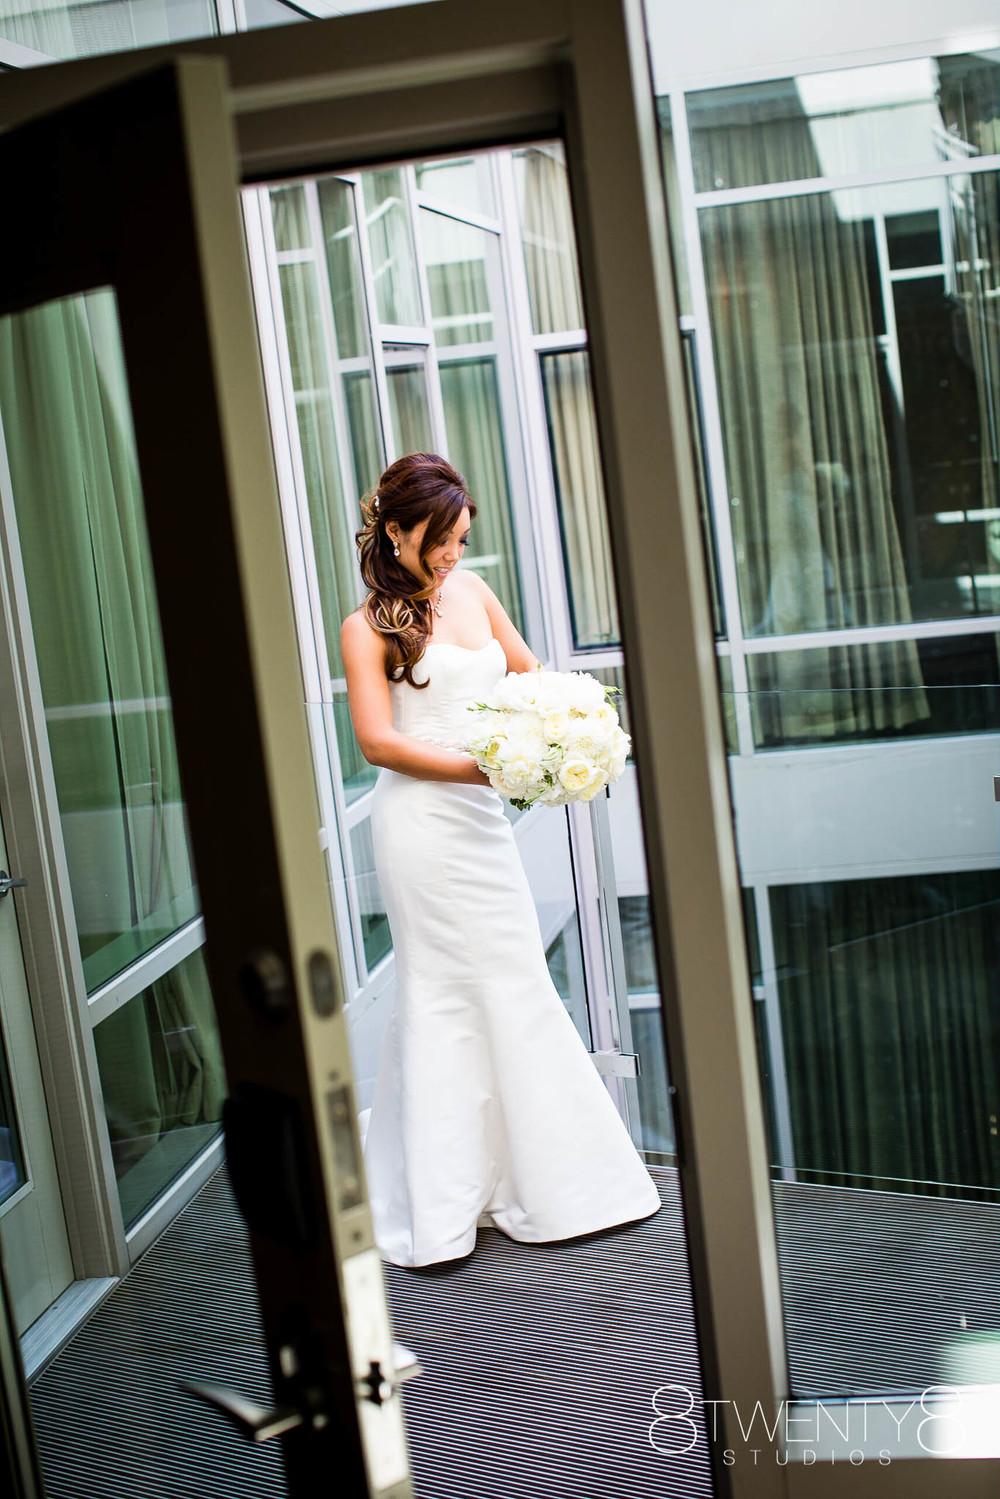 0014-150802-malia-john-wedding-©8twenty8-Studios.jpg